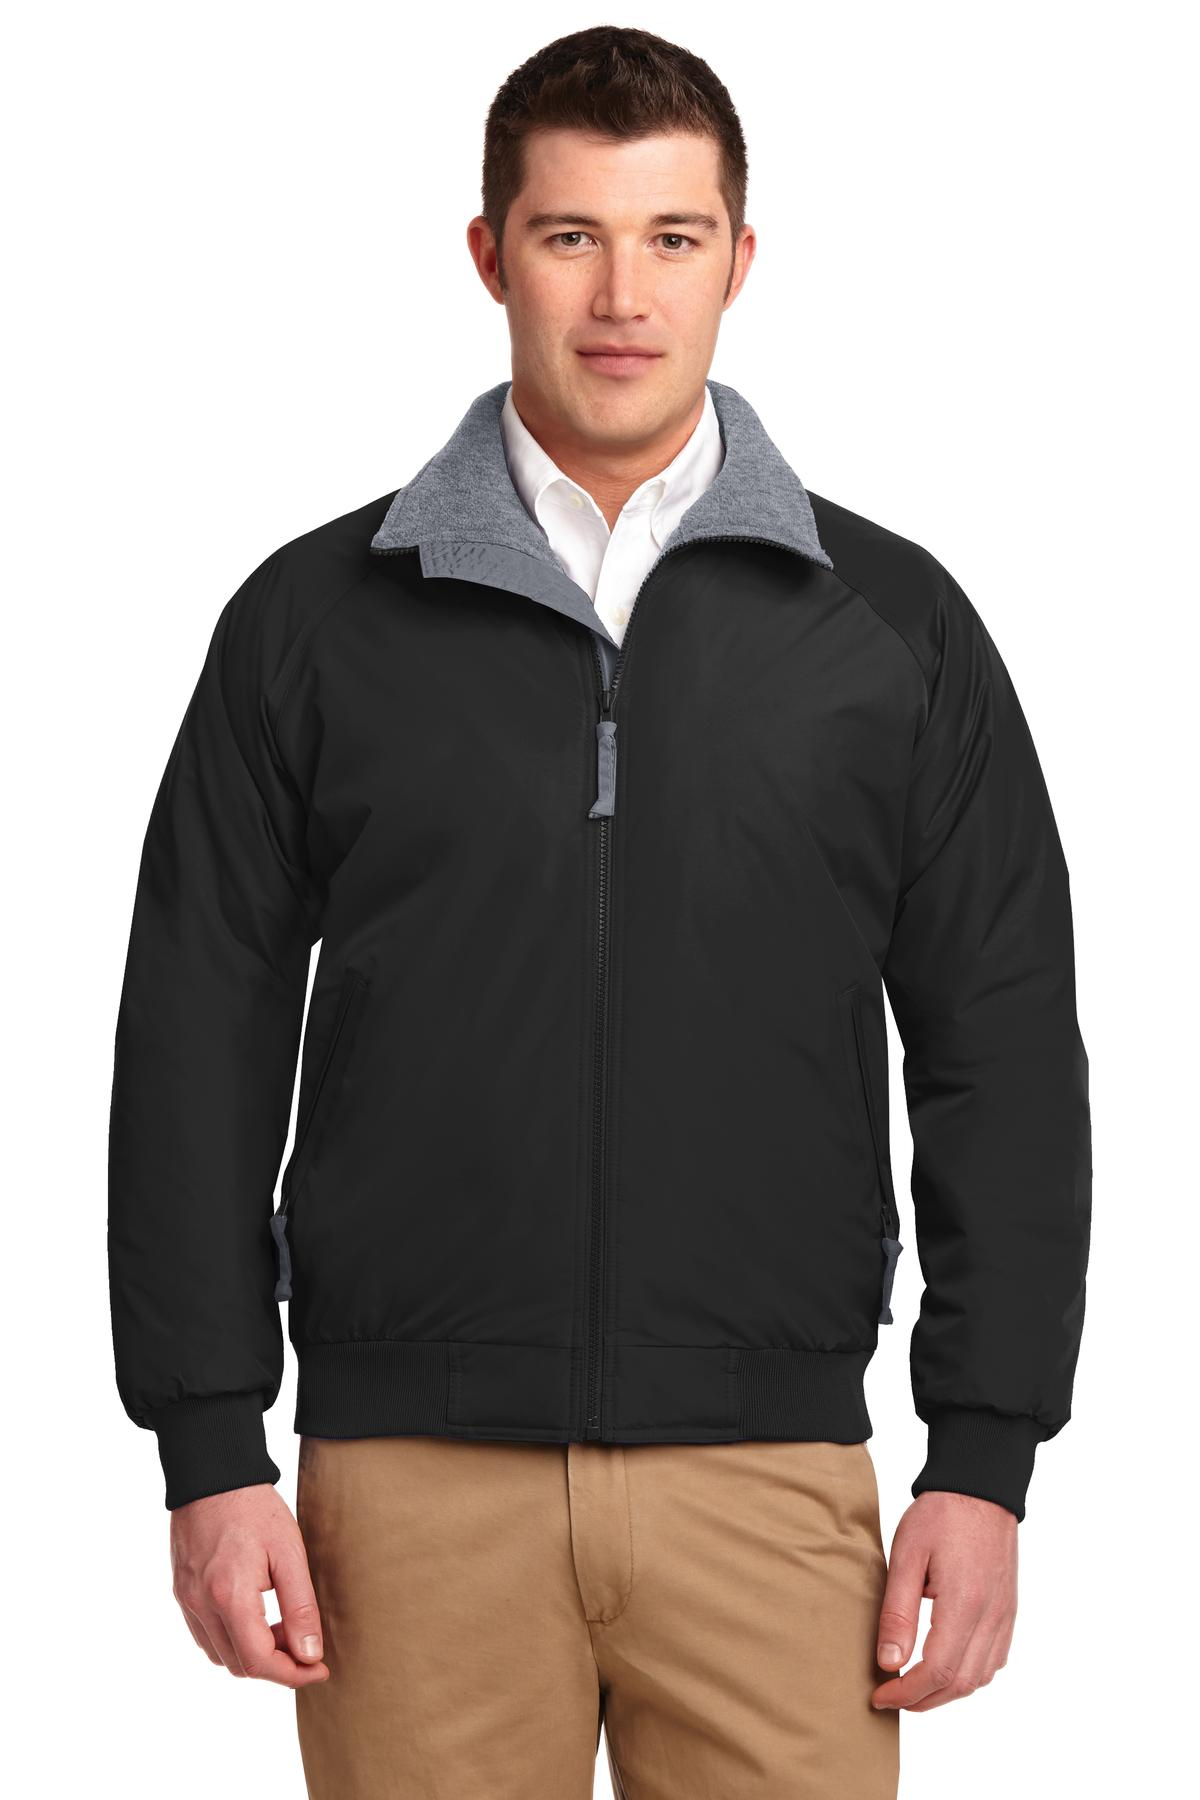 2d8176d578e Buy Port Authority® Challenger Jacket. - Port Authority Online at ...